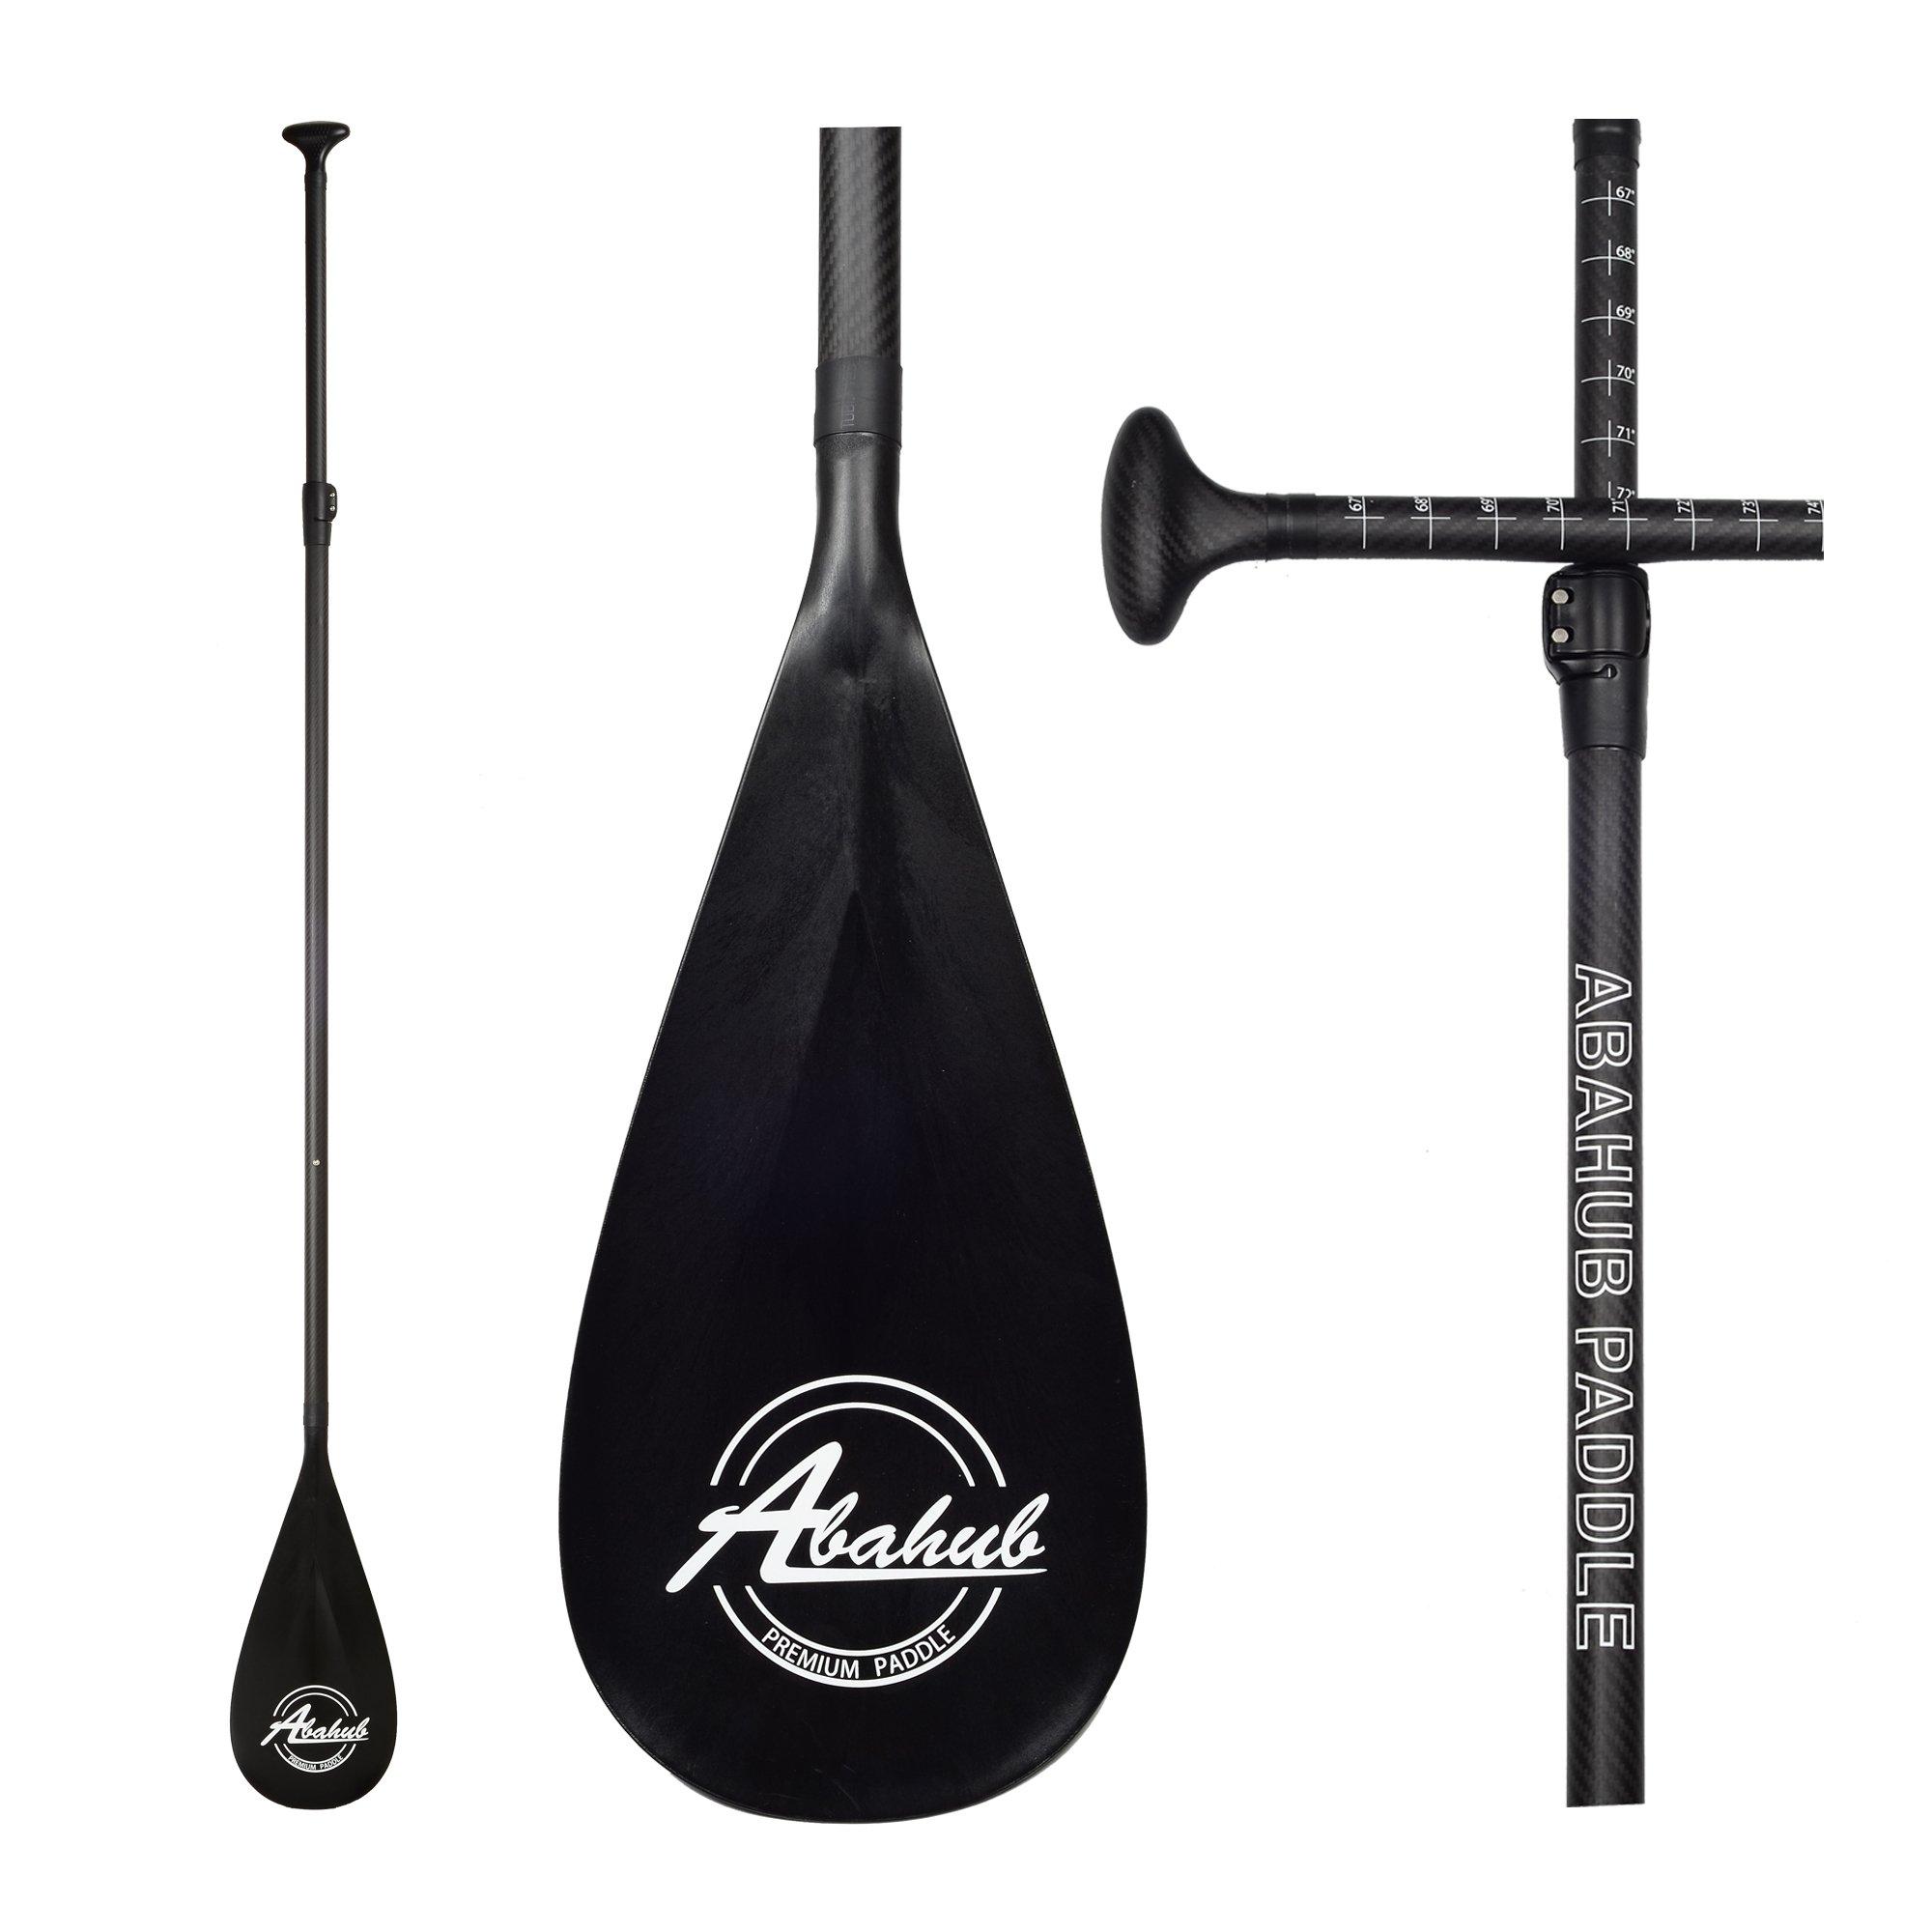 ABAHUB Carbon Fiber SUP Paddle 3-Piece Adjustable Carbon Shaft Black Plastic Blade + Bag